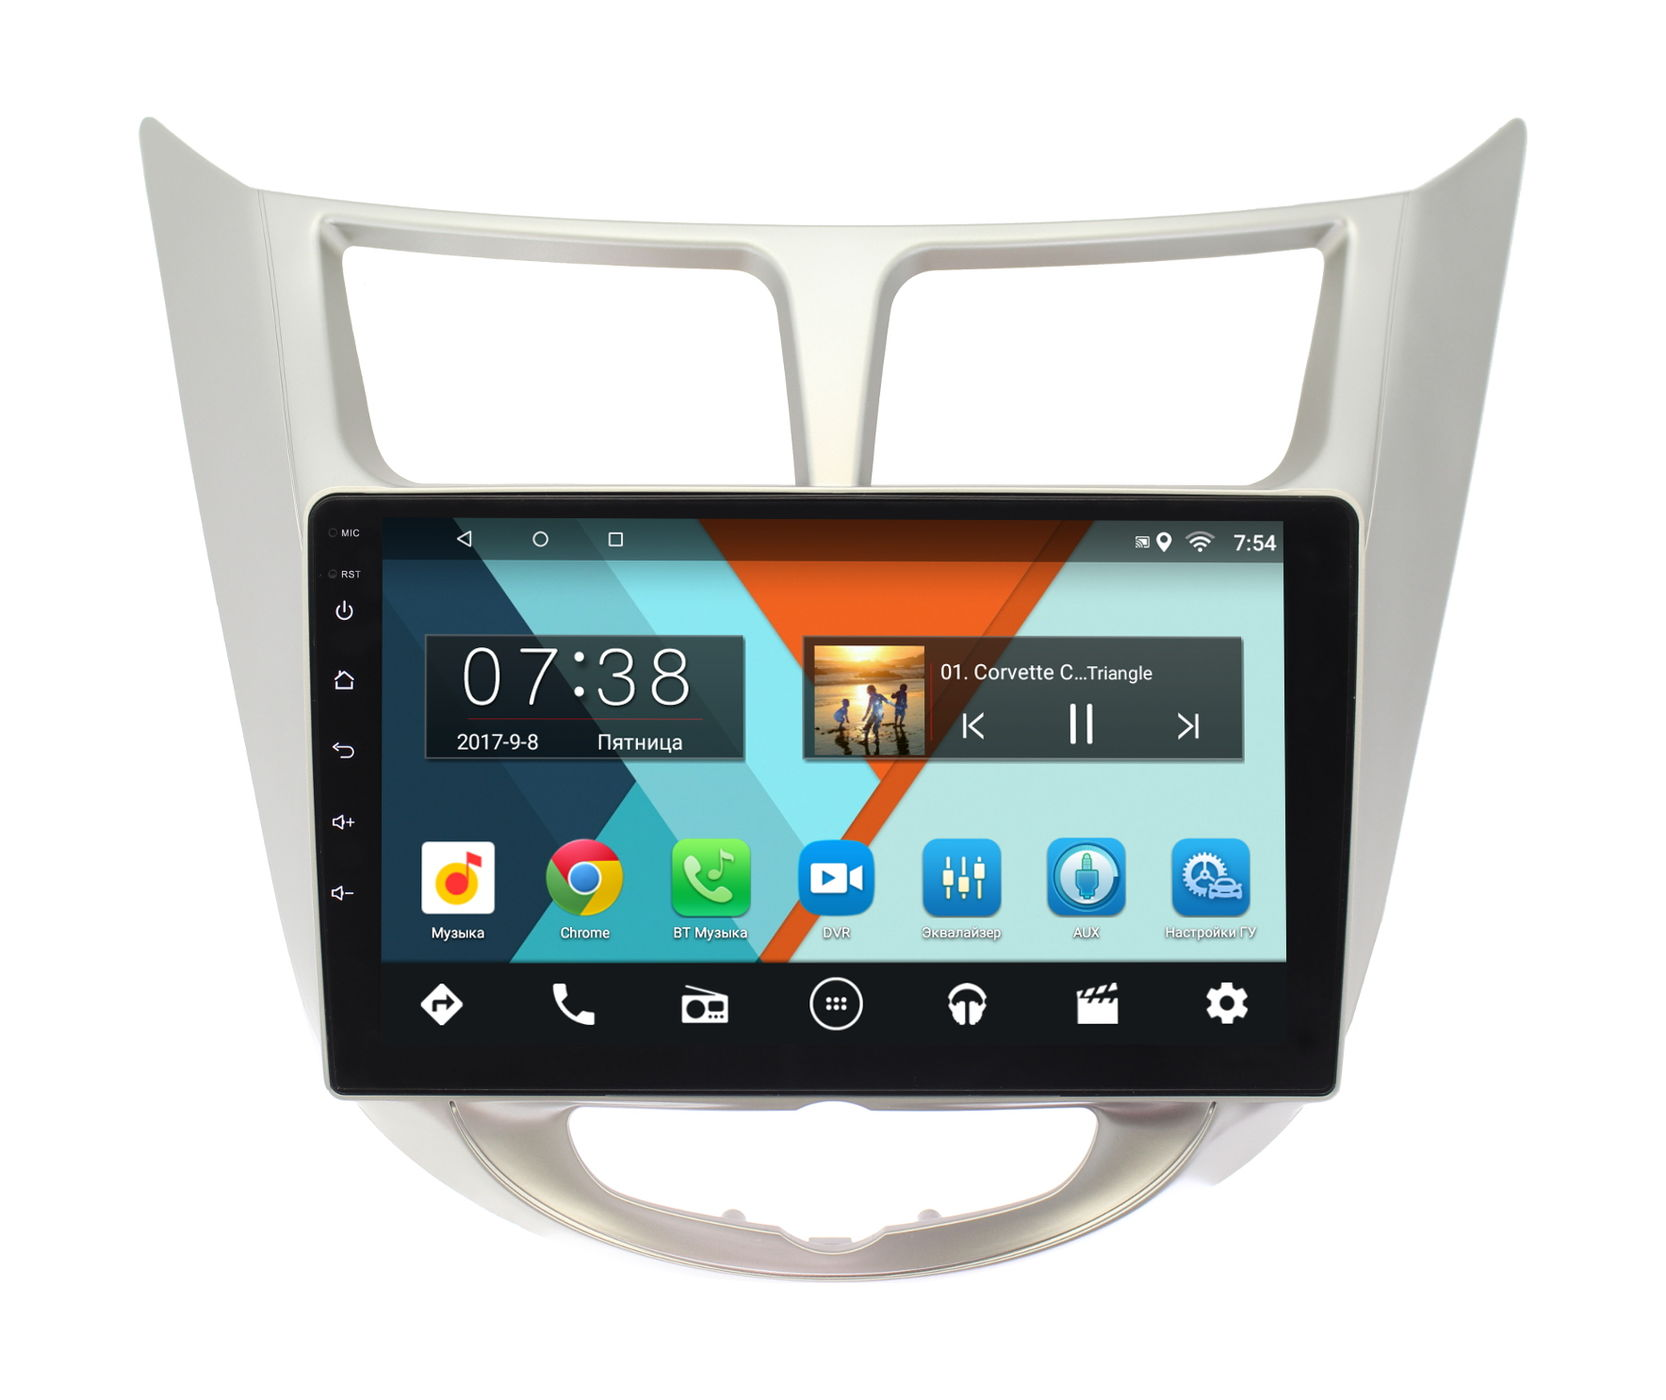 Штатная магнитола Wide Media MT9027MF для Hyundai Solaris I 2011-2017 на Android 6.0.1 cnc aluminum motorcycle accessories rear fender bracket motorbike mudguard for yamaha mt09 mt 09 fz 09 fz mt 09 2014 2015